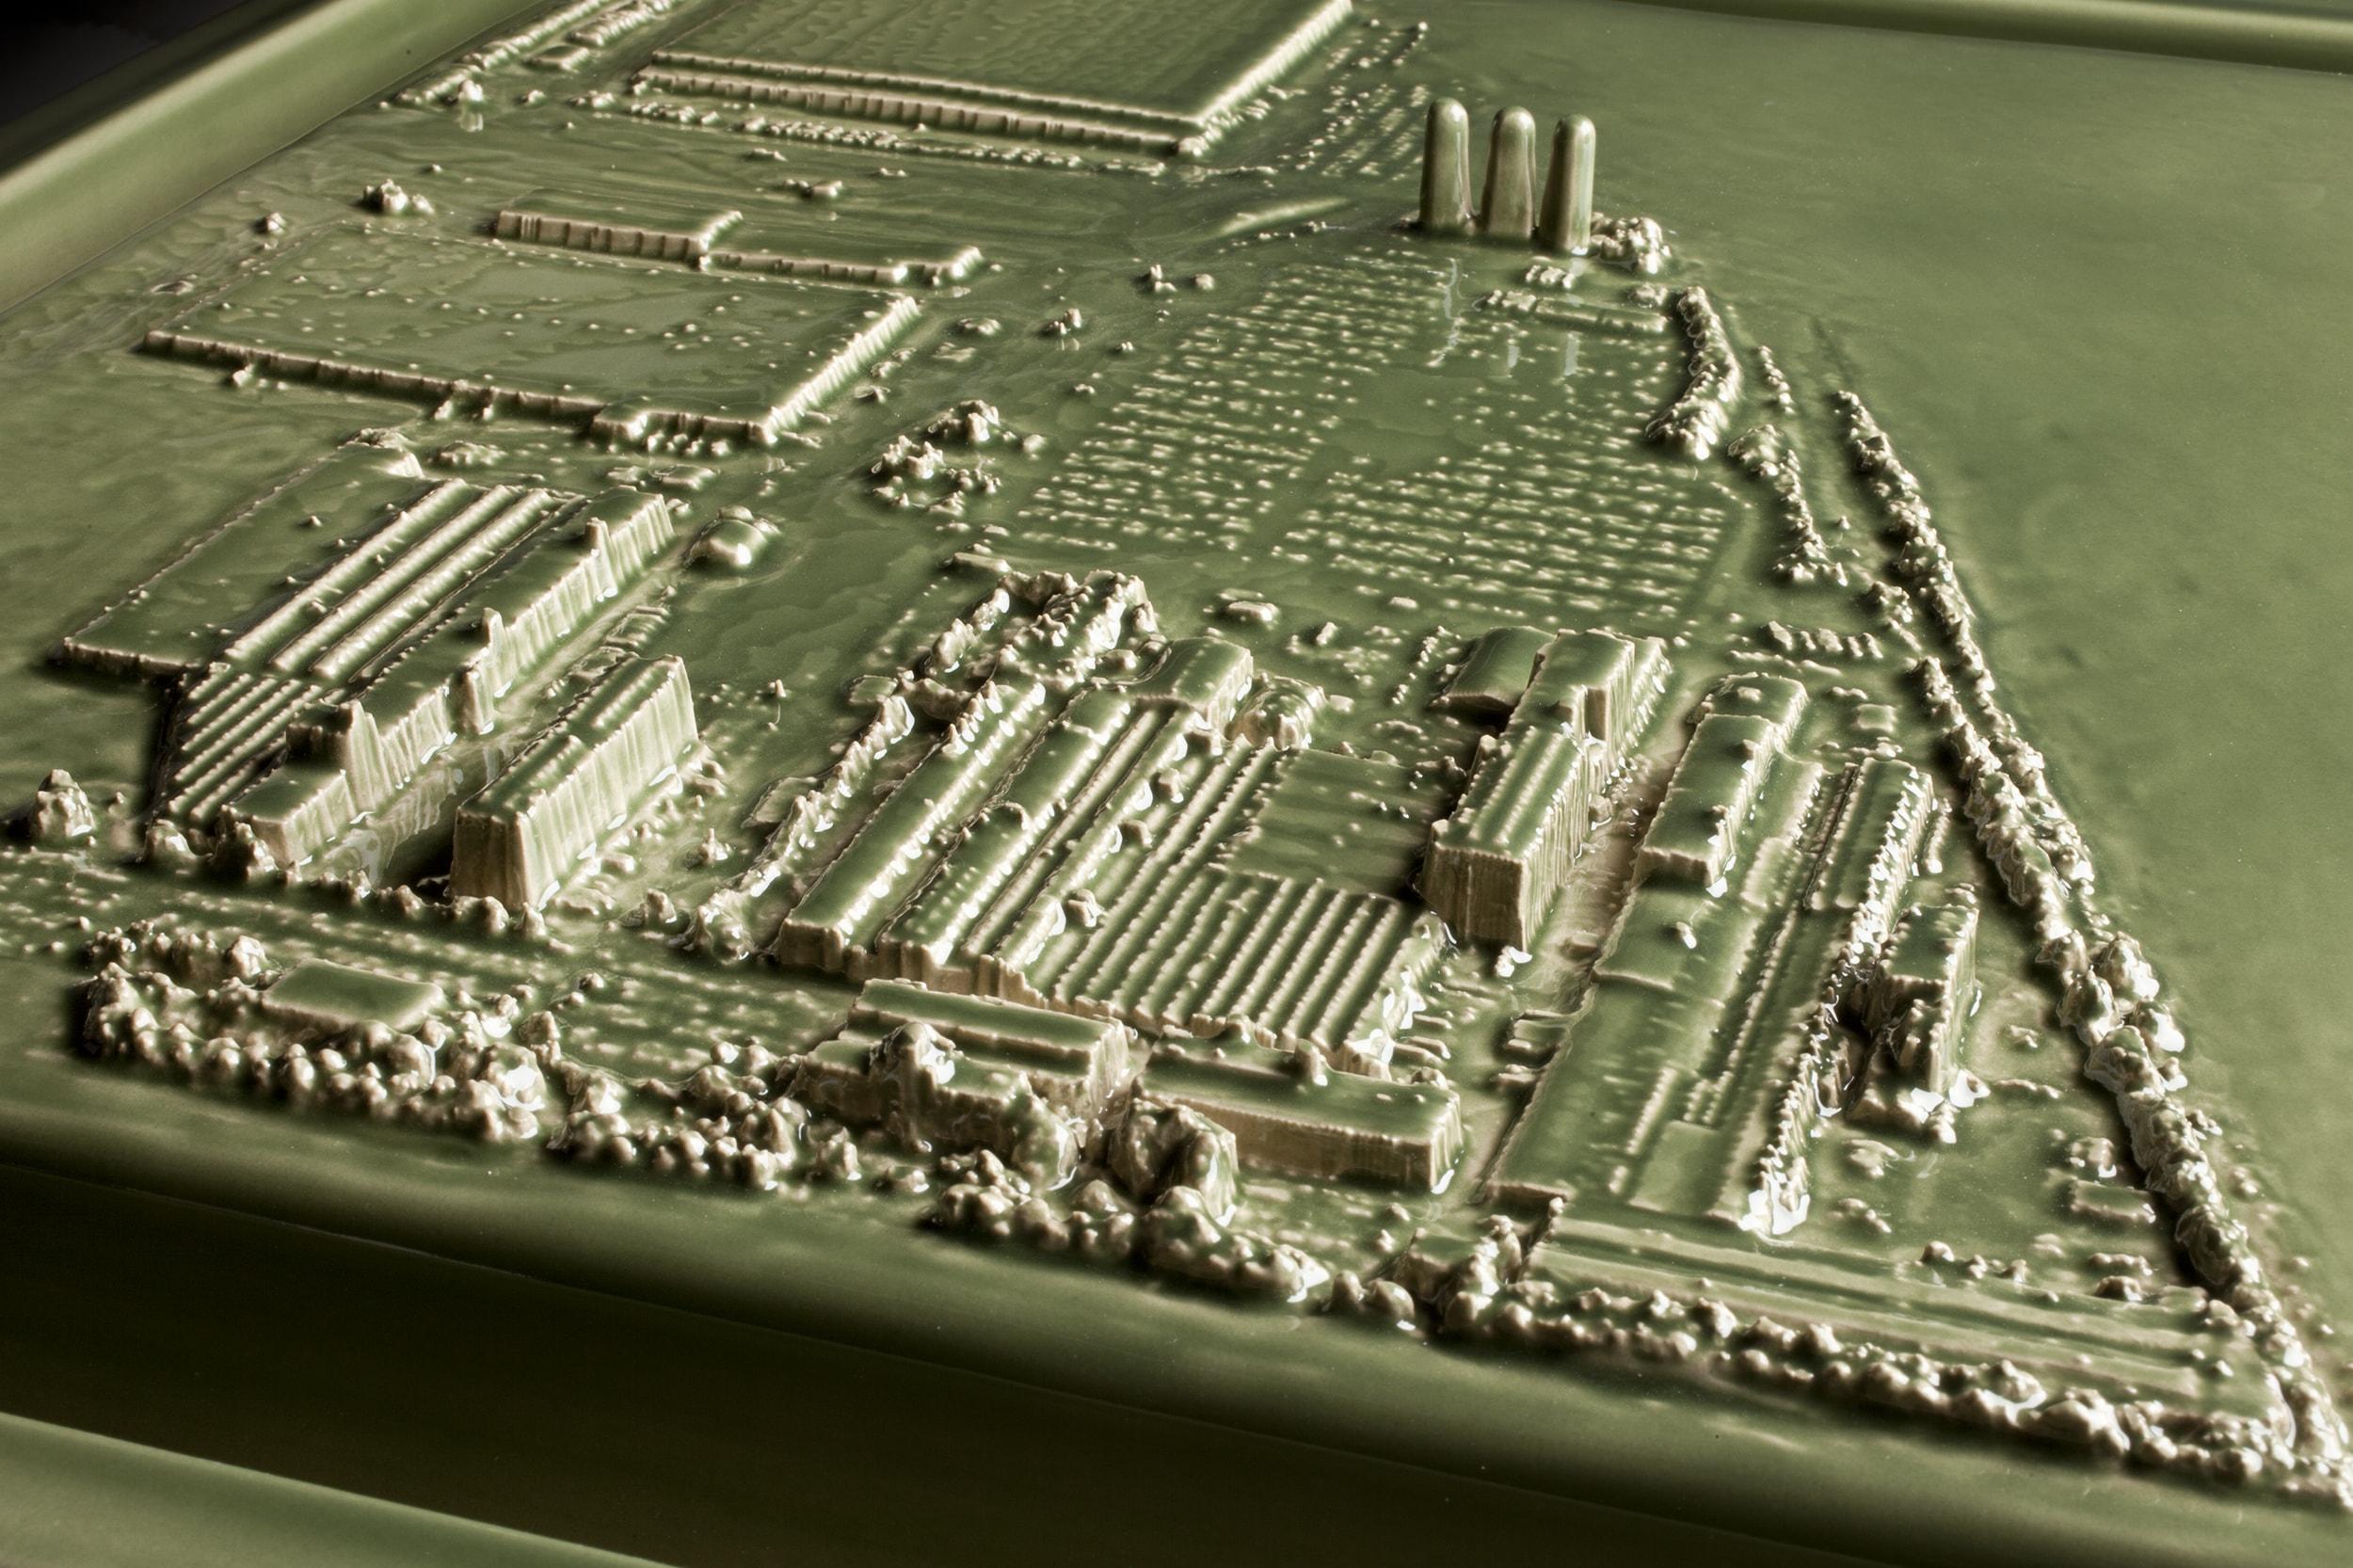 Kohler Triptych Green Factory (detail)